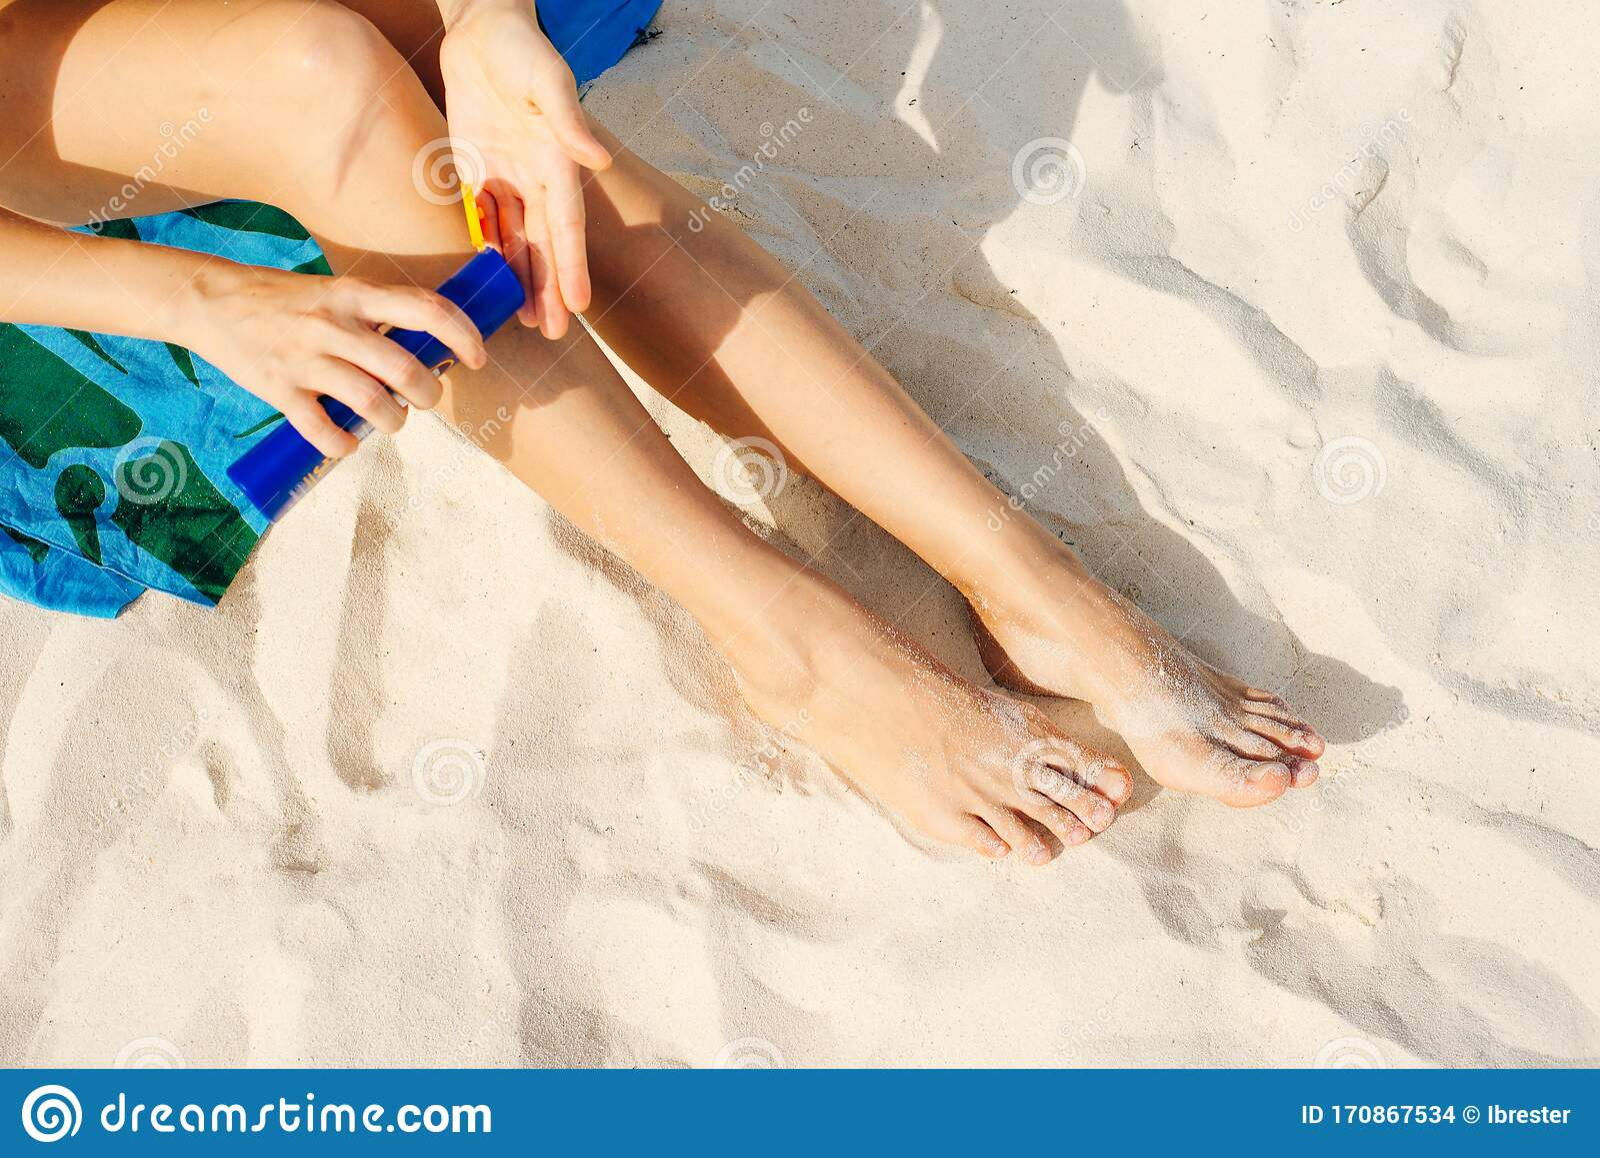 Sunbathing Women Naked Beach Stock Photos, Pictures